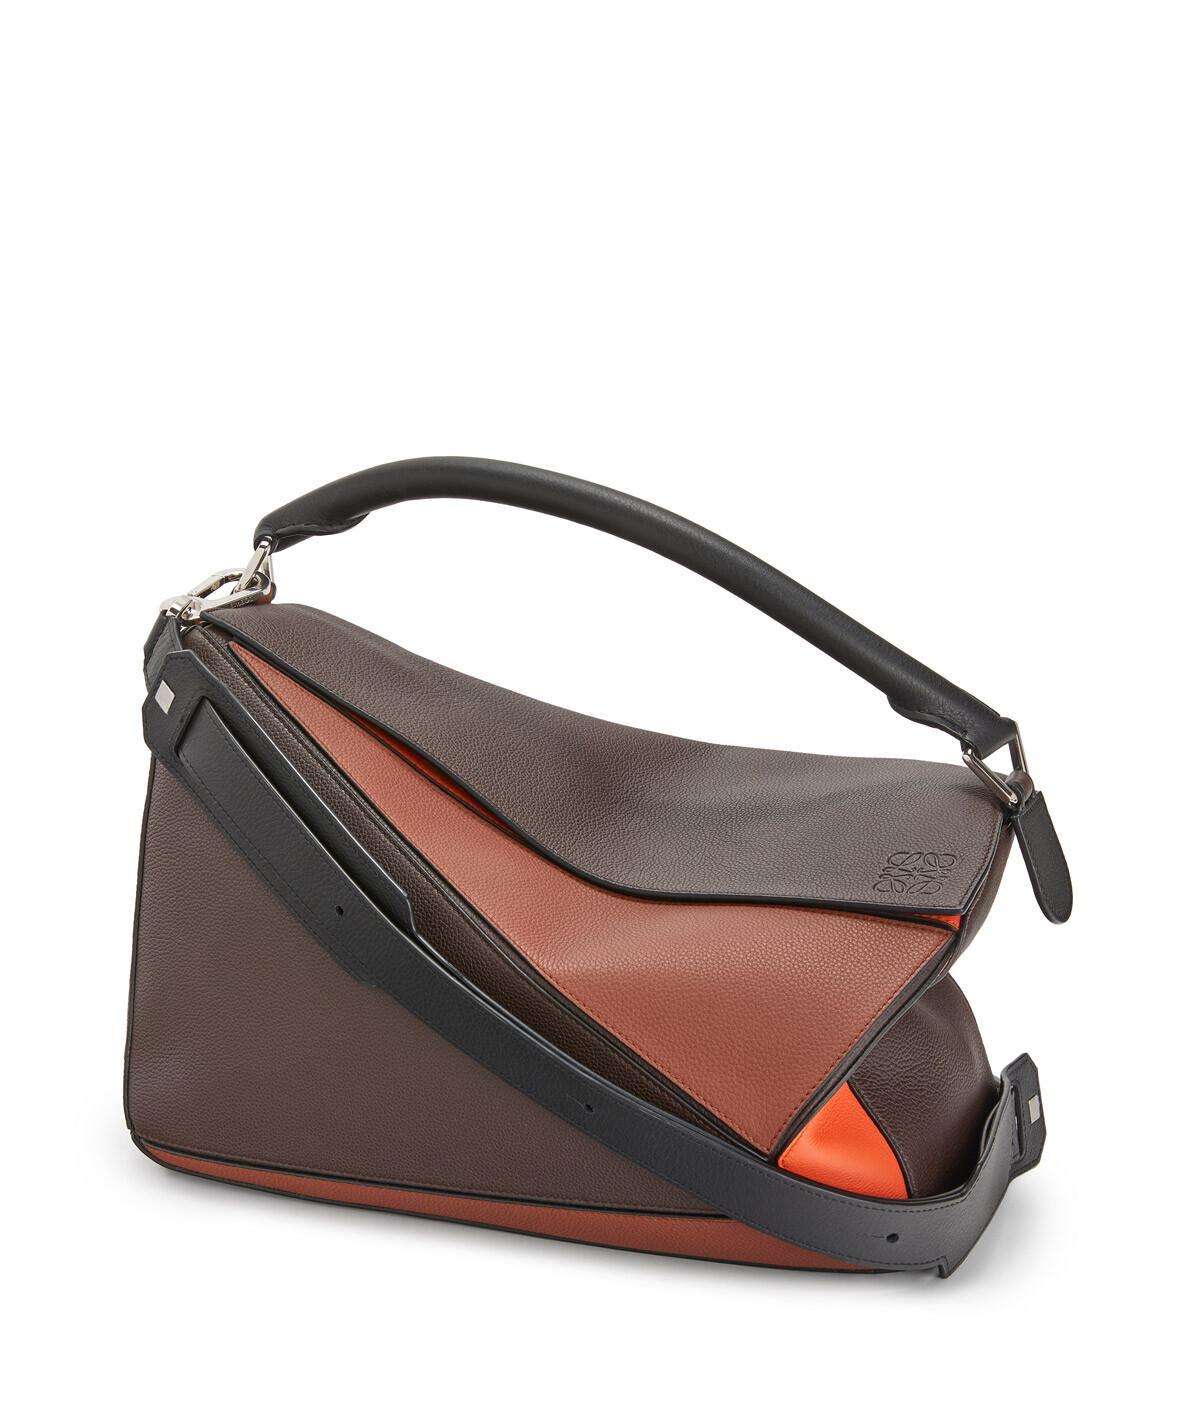 LOEWE Puzzle Large Bag Chocolate Brown/Orange front